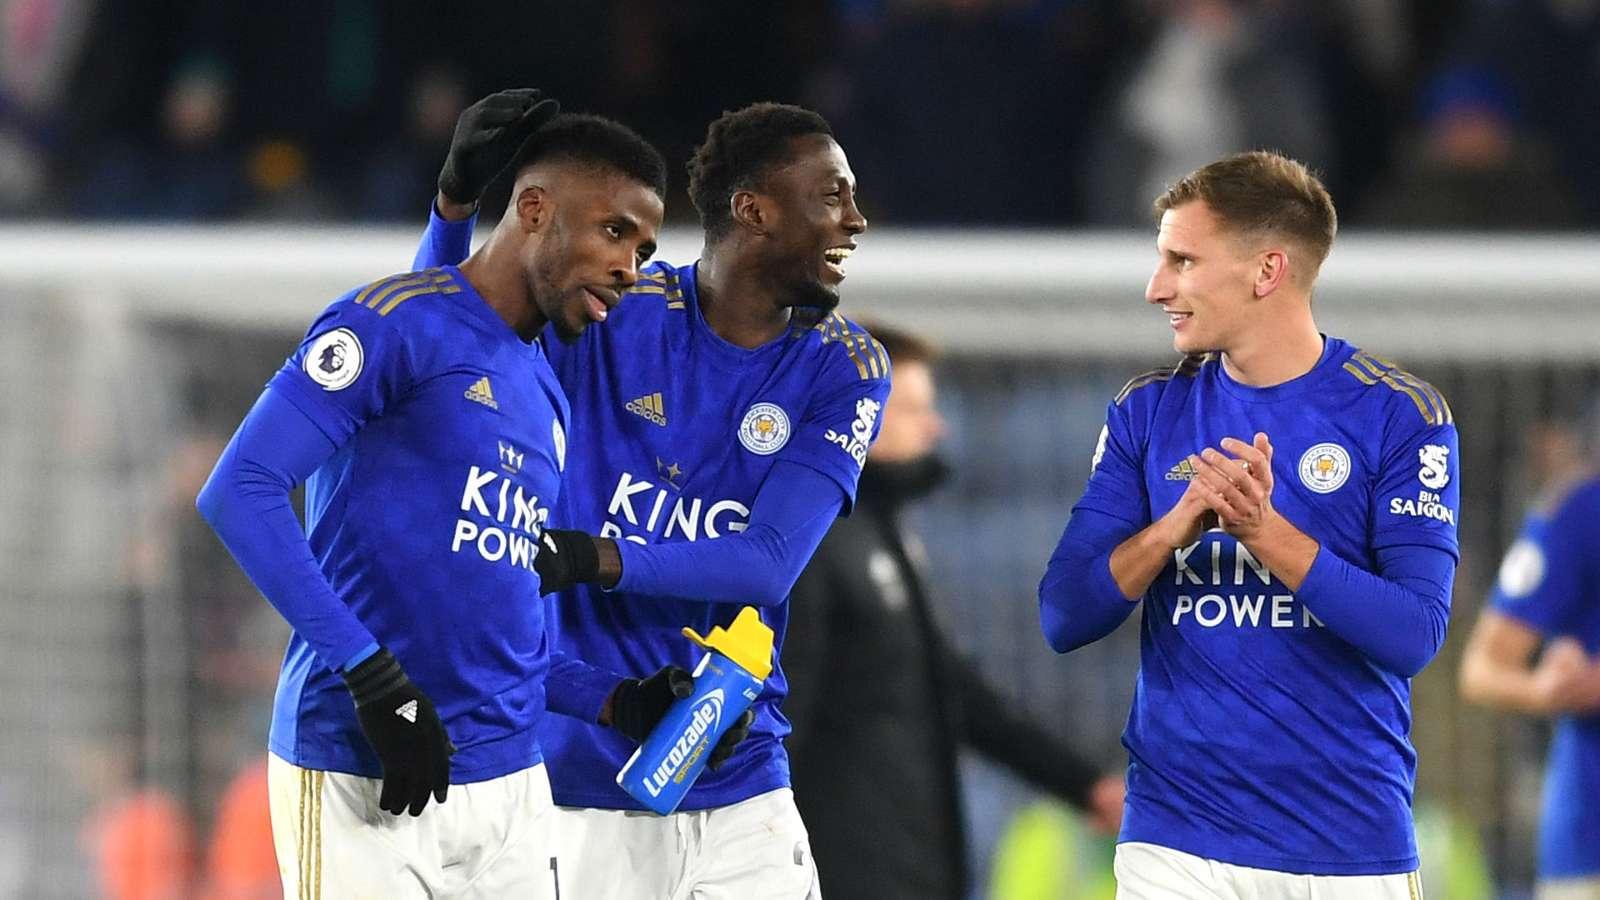 iheanacho leicester 2019 1ae6ld874z1341c560ycn96gy2 - EPL: Iheanacho's goal helps Leicester beat West Ham United